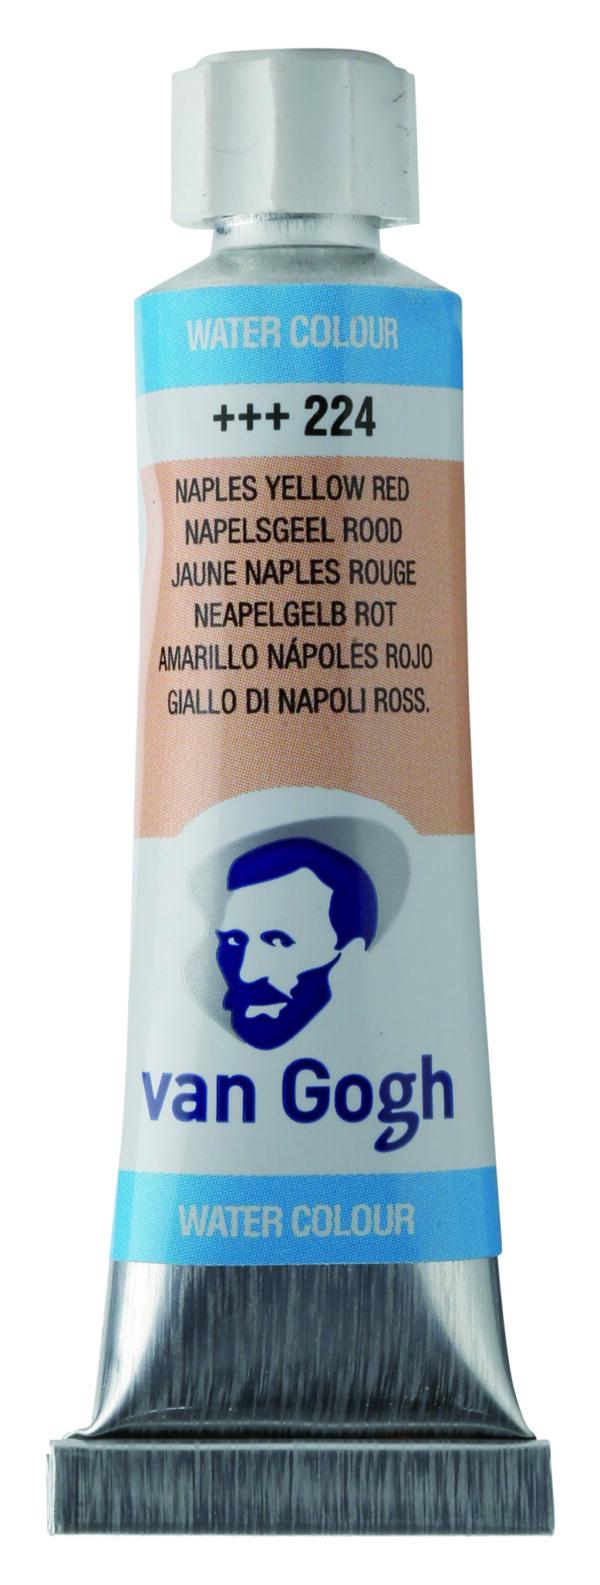 Van Gogh 224 Naples yellow red - 10 ml